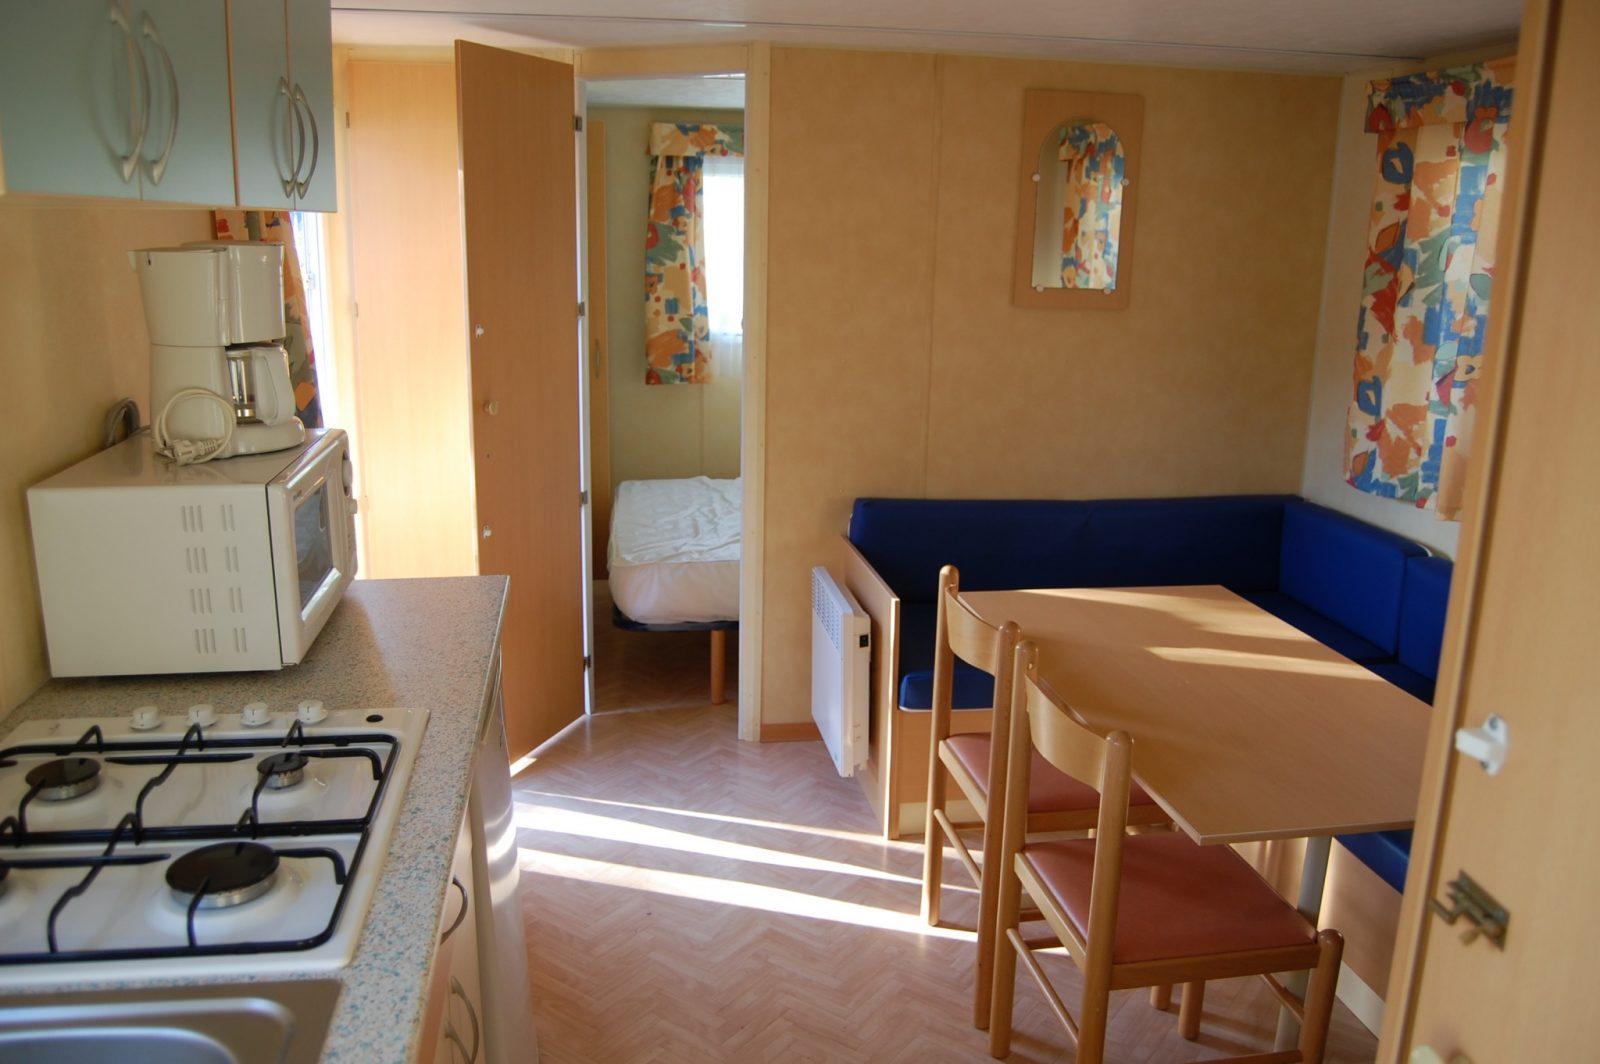 mobil home les clarines 21m 2 chambres auvergne cure la. Black Bedroom Furniture Sets. Home Design Ideas